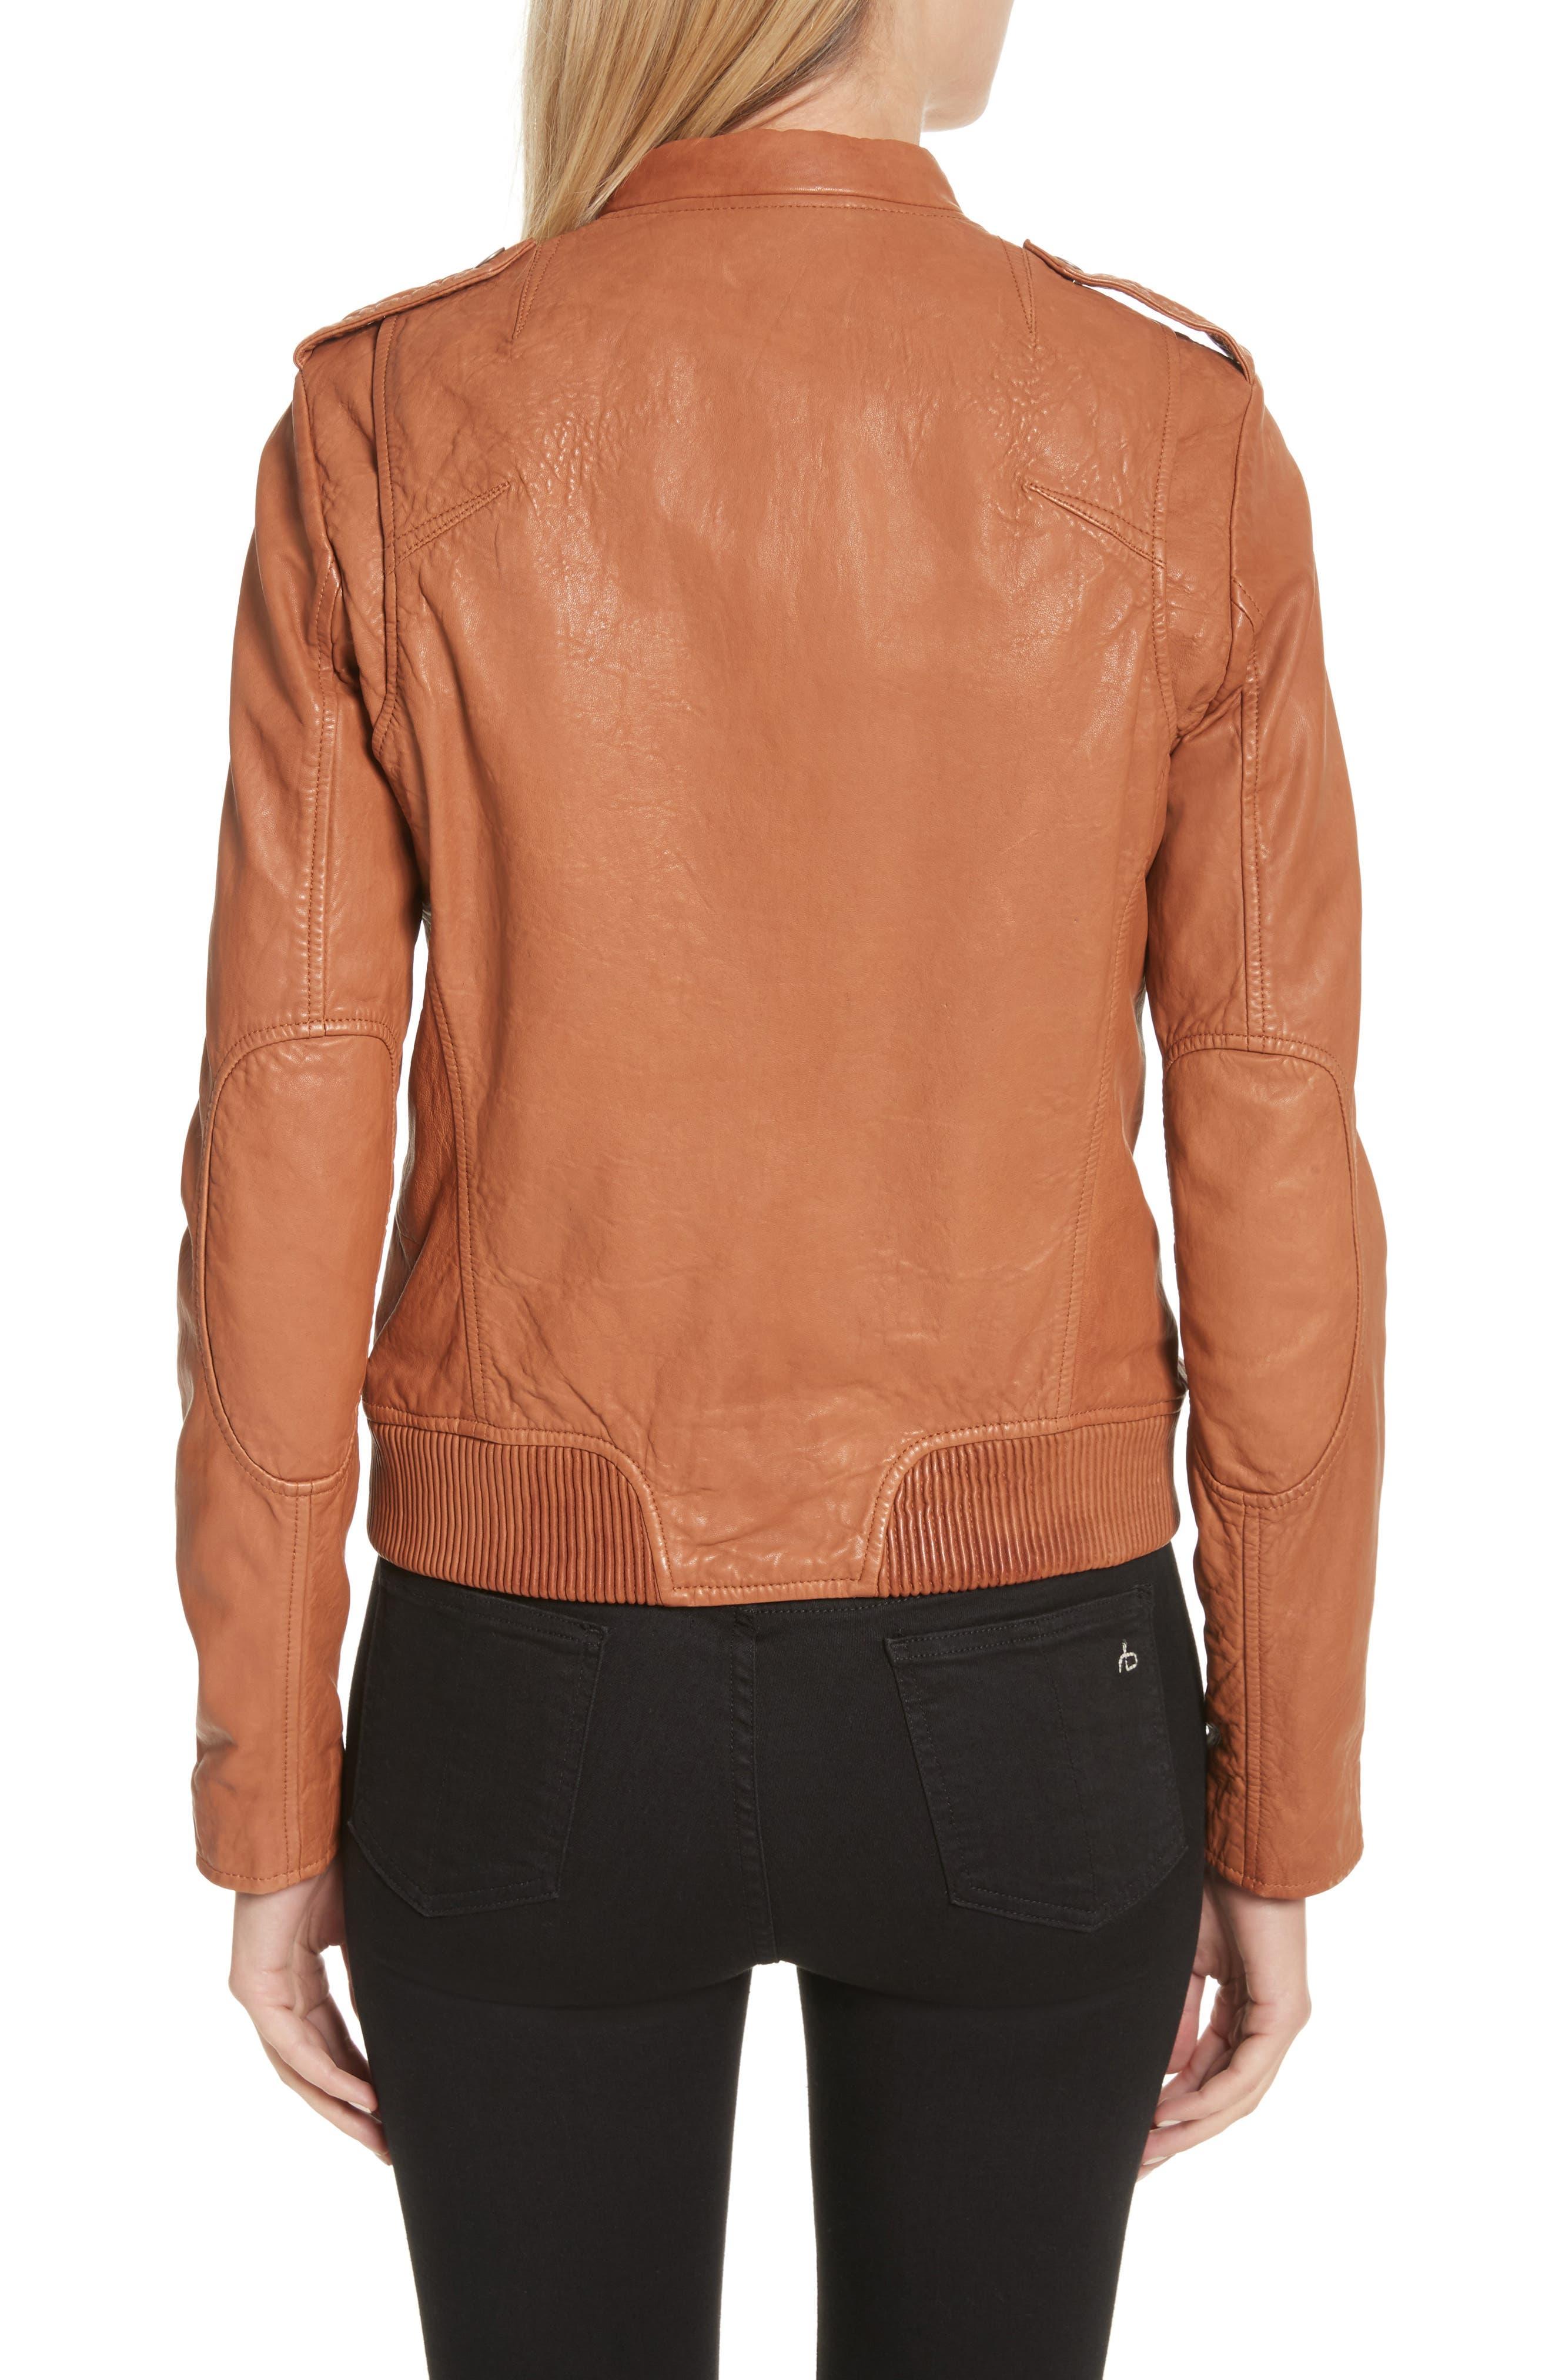 Lyon Leather Jacket,                             Alternate thumbnail 2, color,                             200